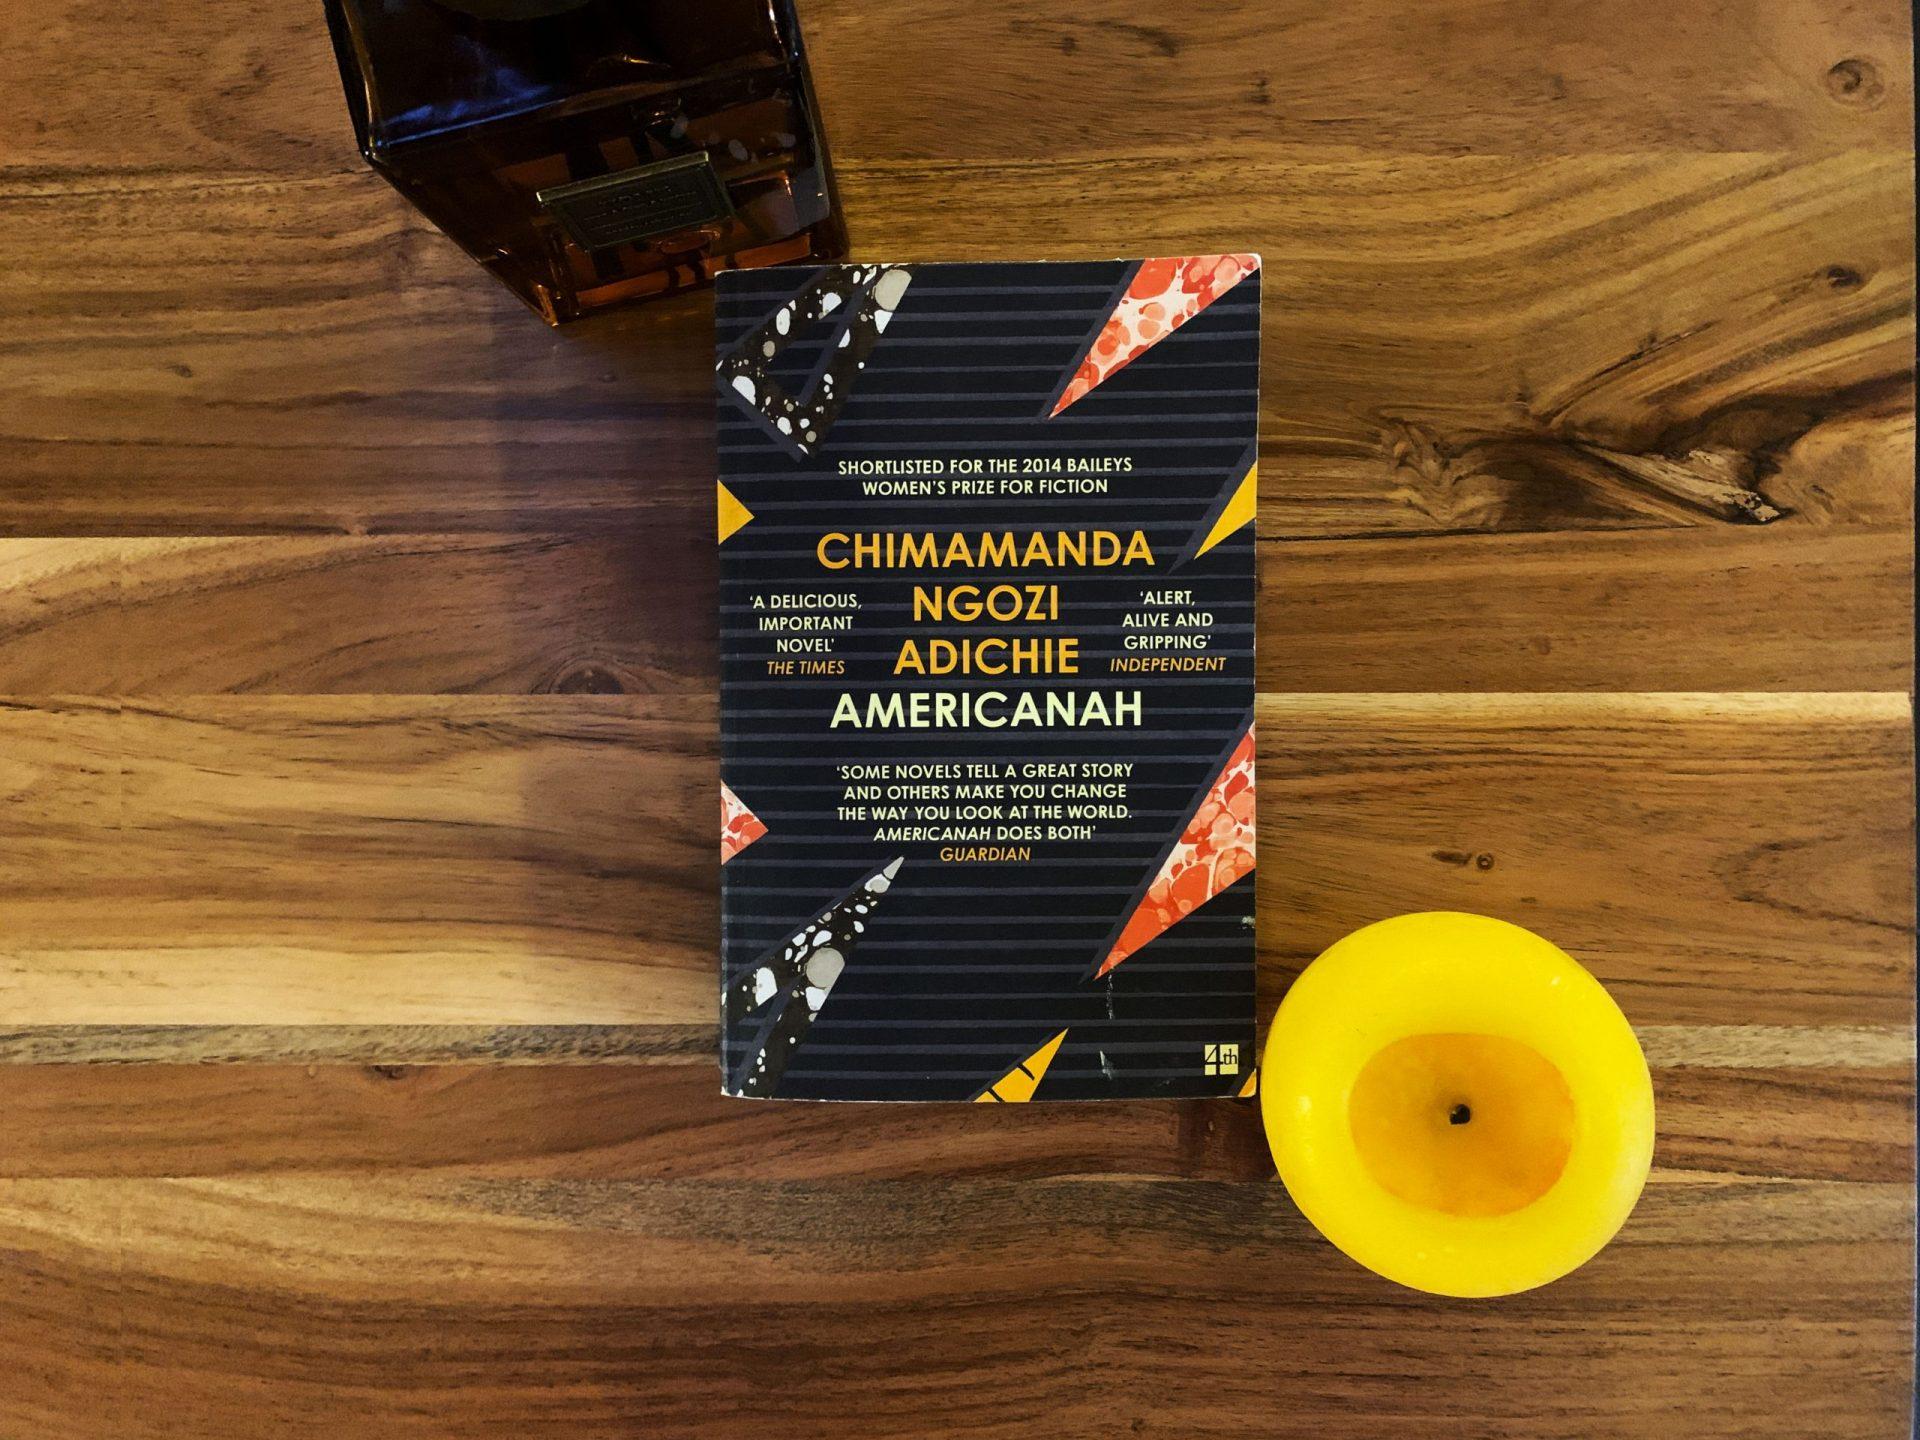 chimamanda_blog_web_rev